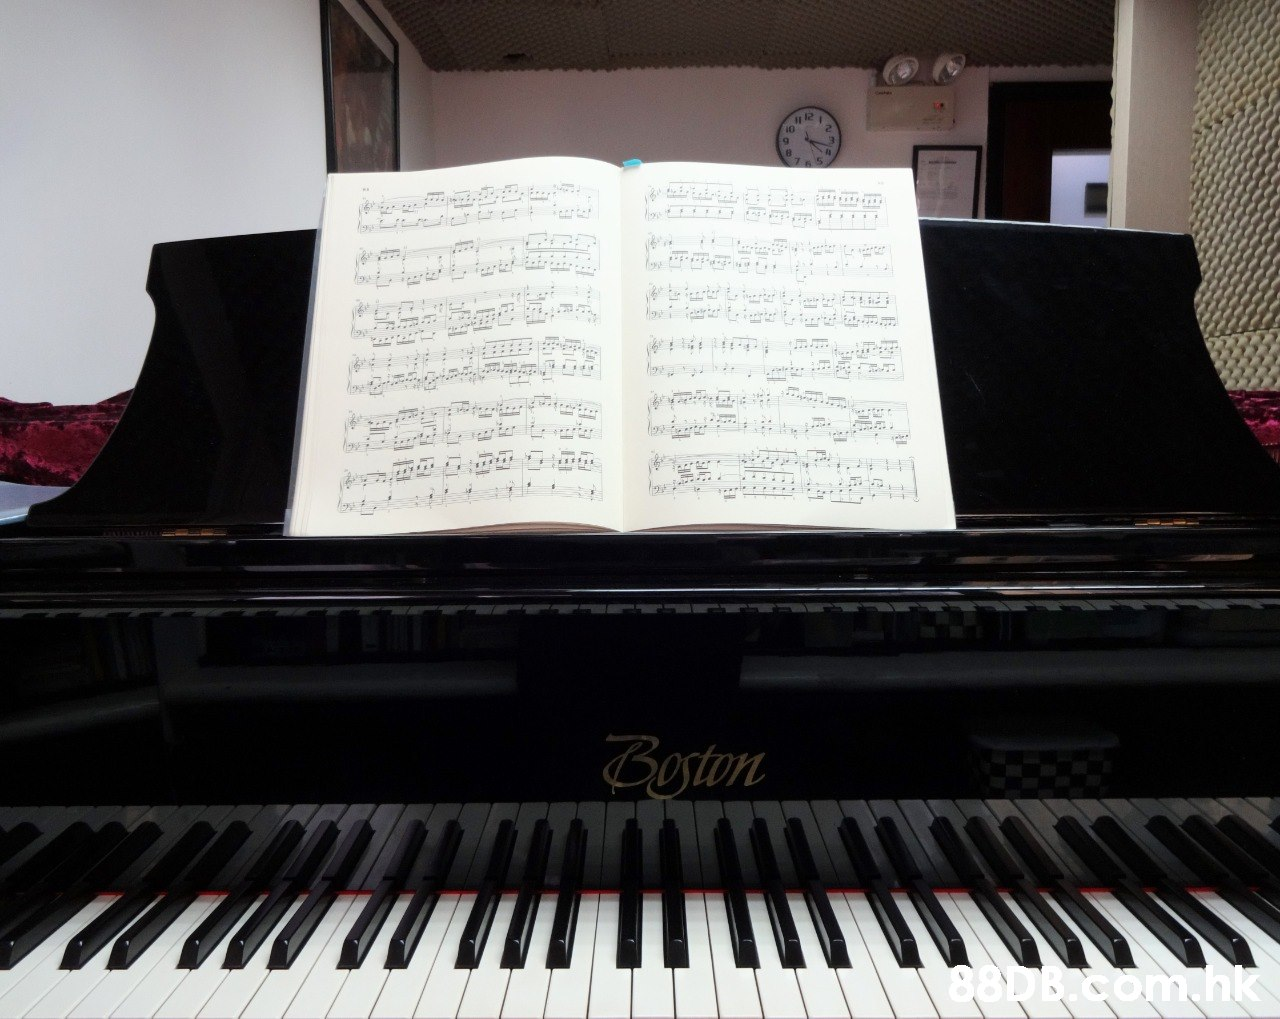 Boston 88D B.com.hk  Piano,Musical instrument,Electronic instrument,Musical keyboard,Keyboard